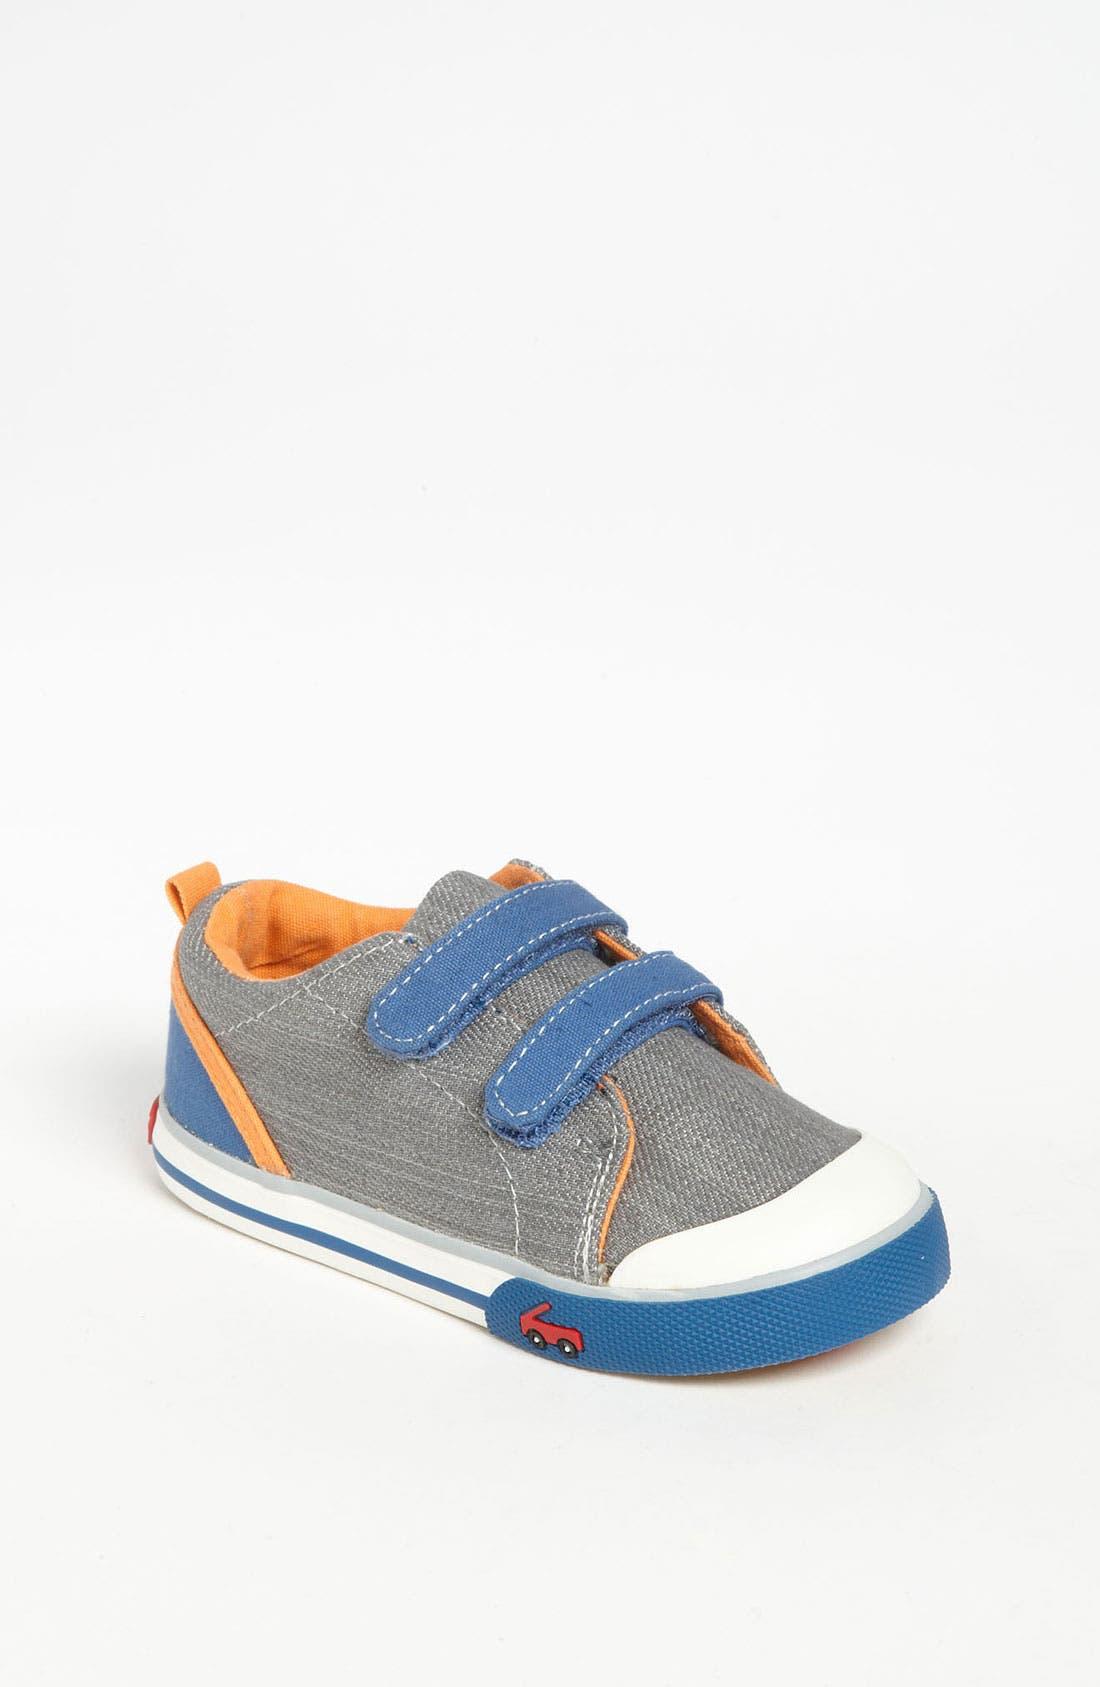 Alternate Image 1 Selected - See Kai Run 'Esten' Sneaker (Baby, Walker & Toddler)